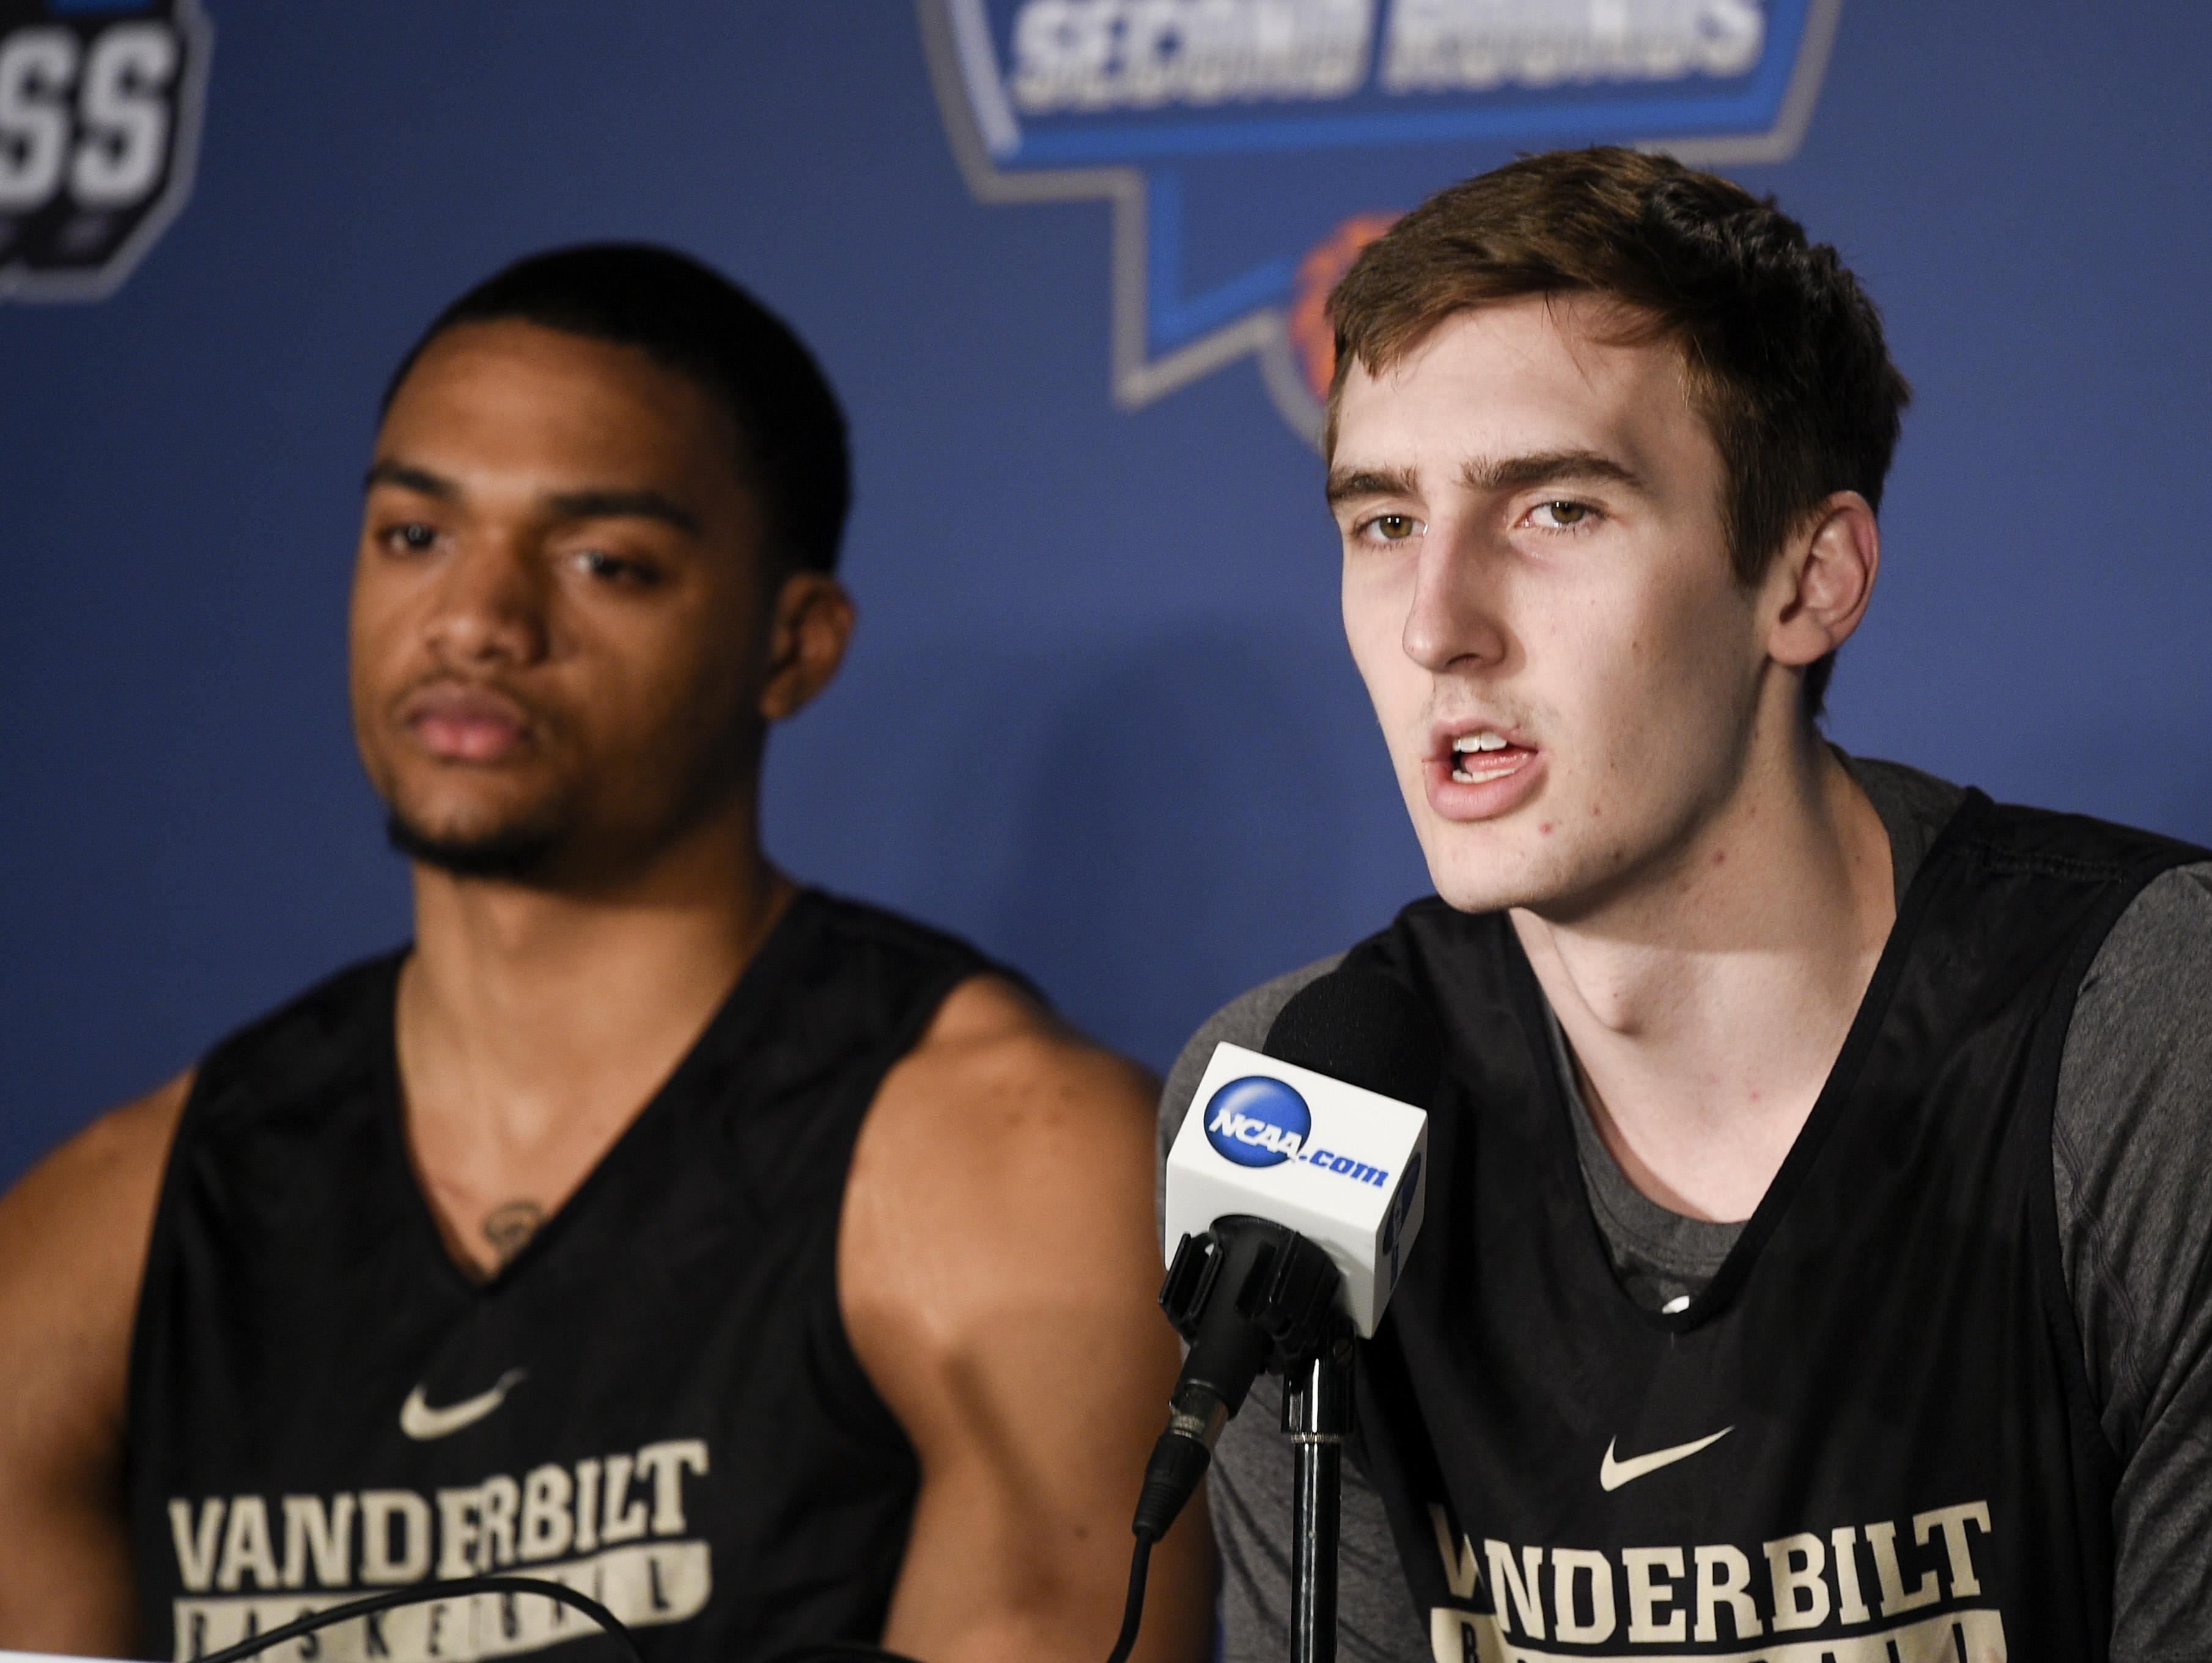 Vanderbilt forward Luke Kornet (right) talks during an interview Wednesday with the media at Vivint Smart Home Arena.